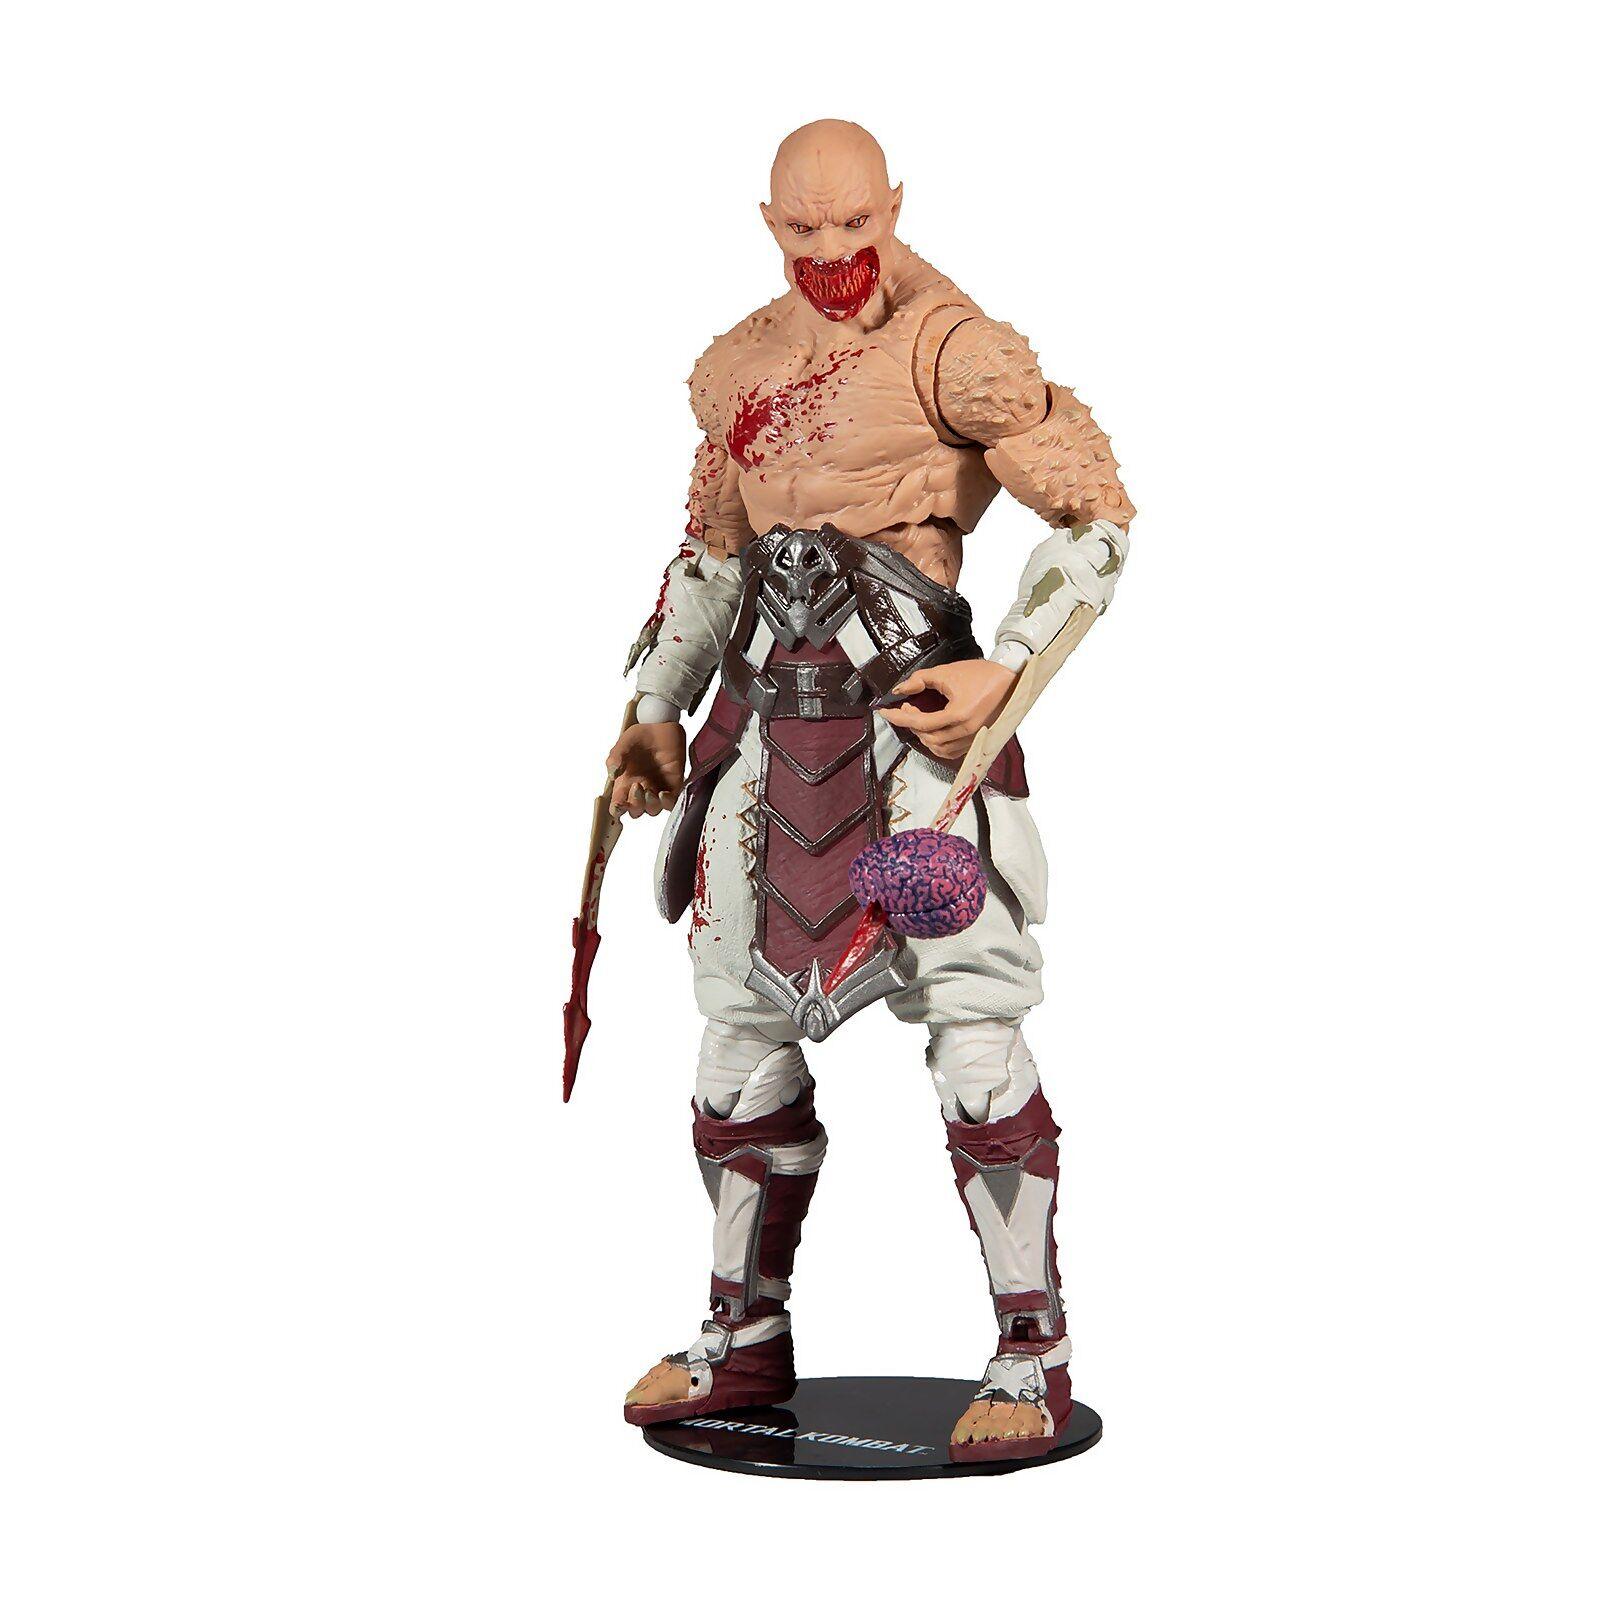 McFarlane Toys McFarlane Mortal Kombat 4 7 Figures - Baraka - Bloody Action Figure